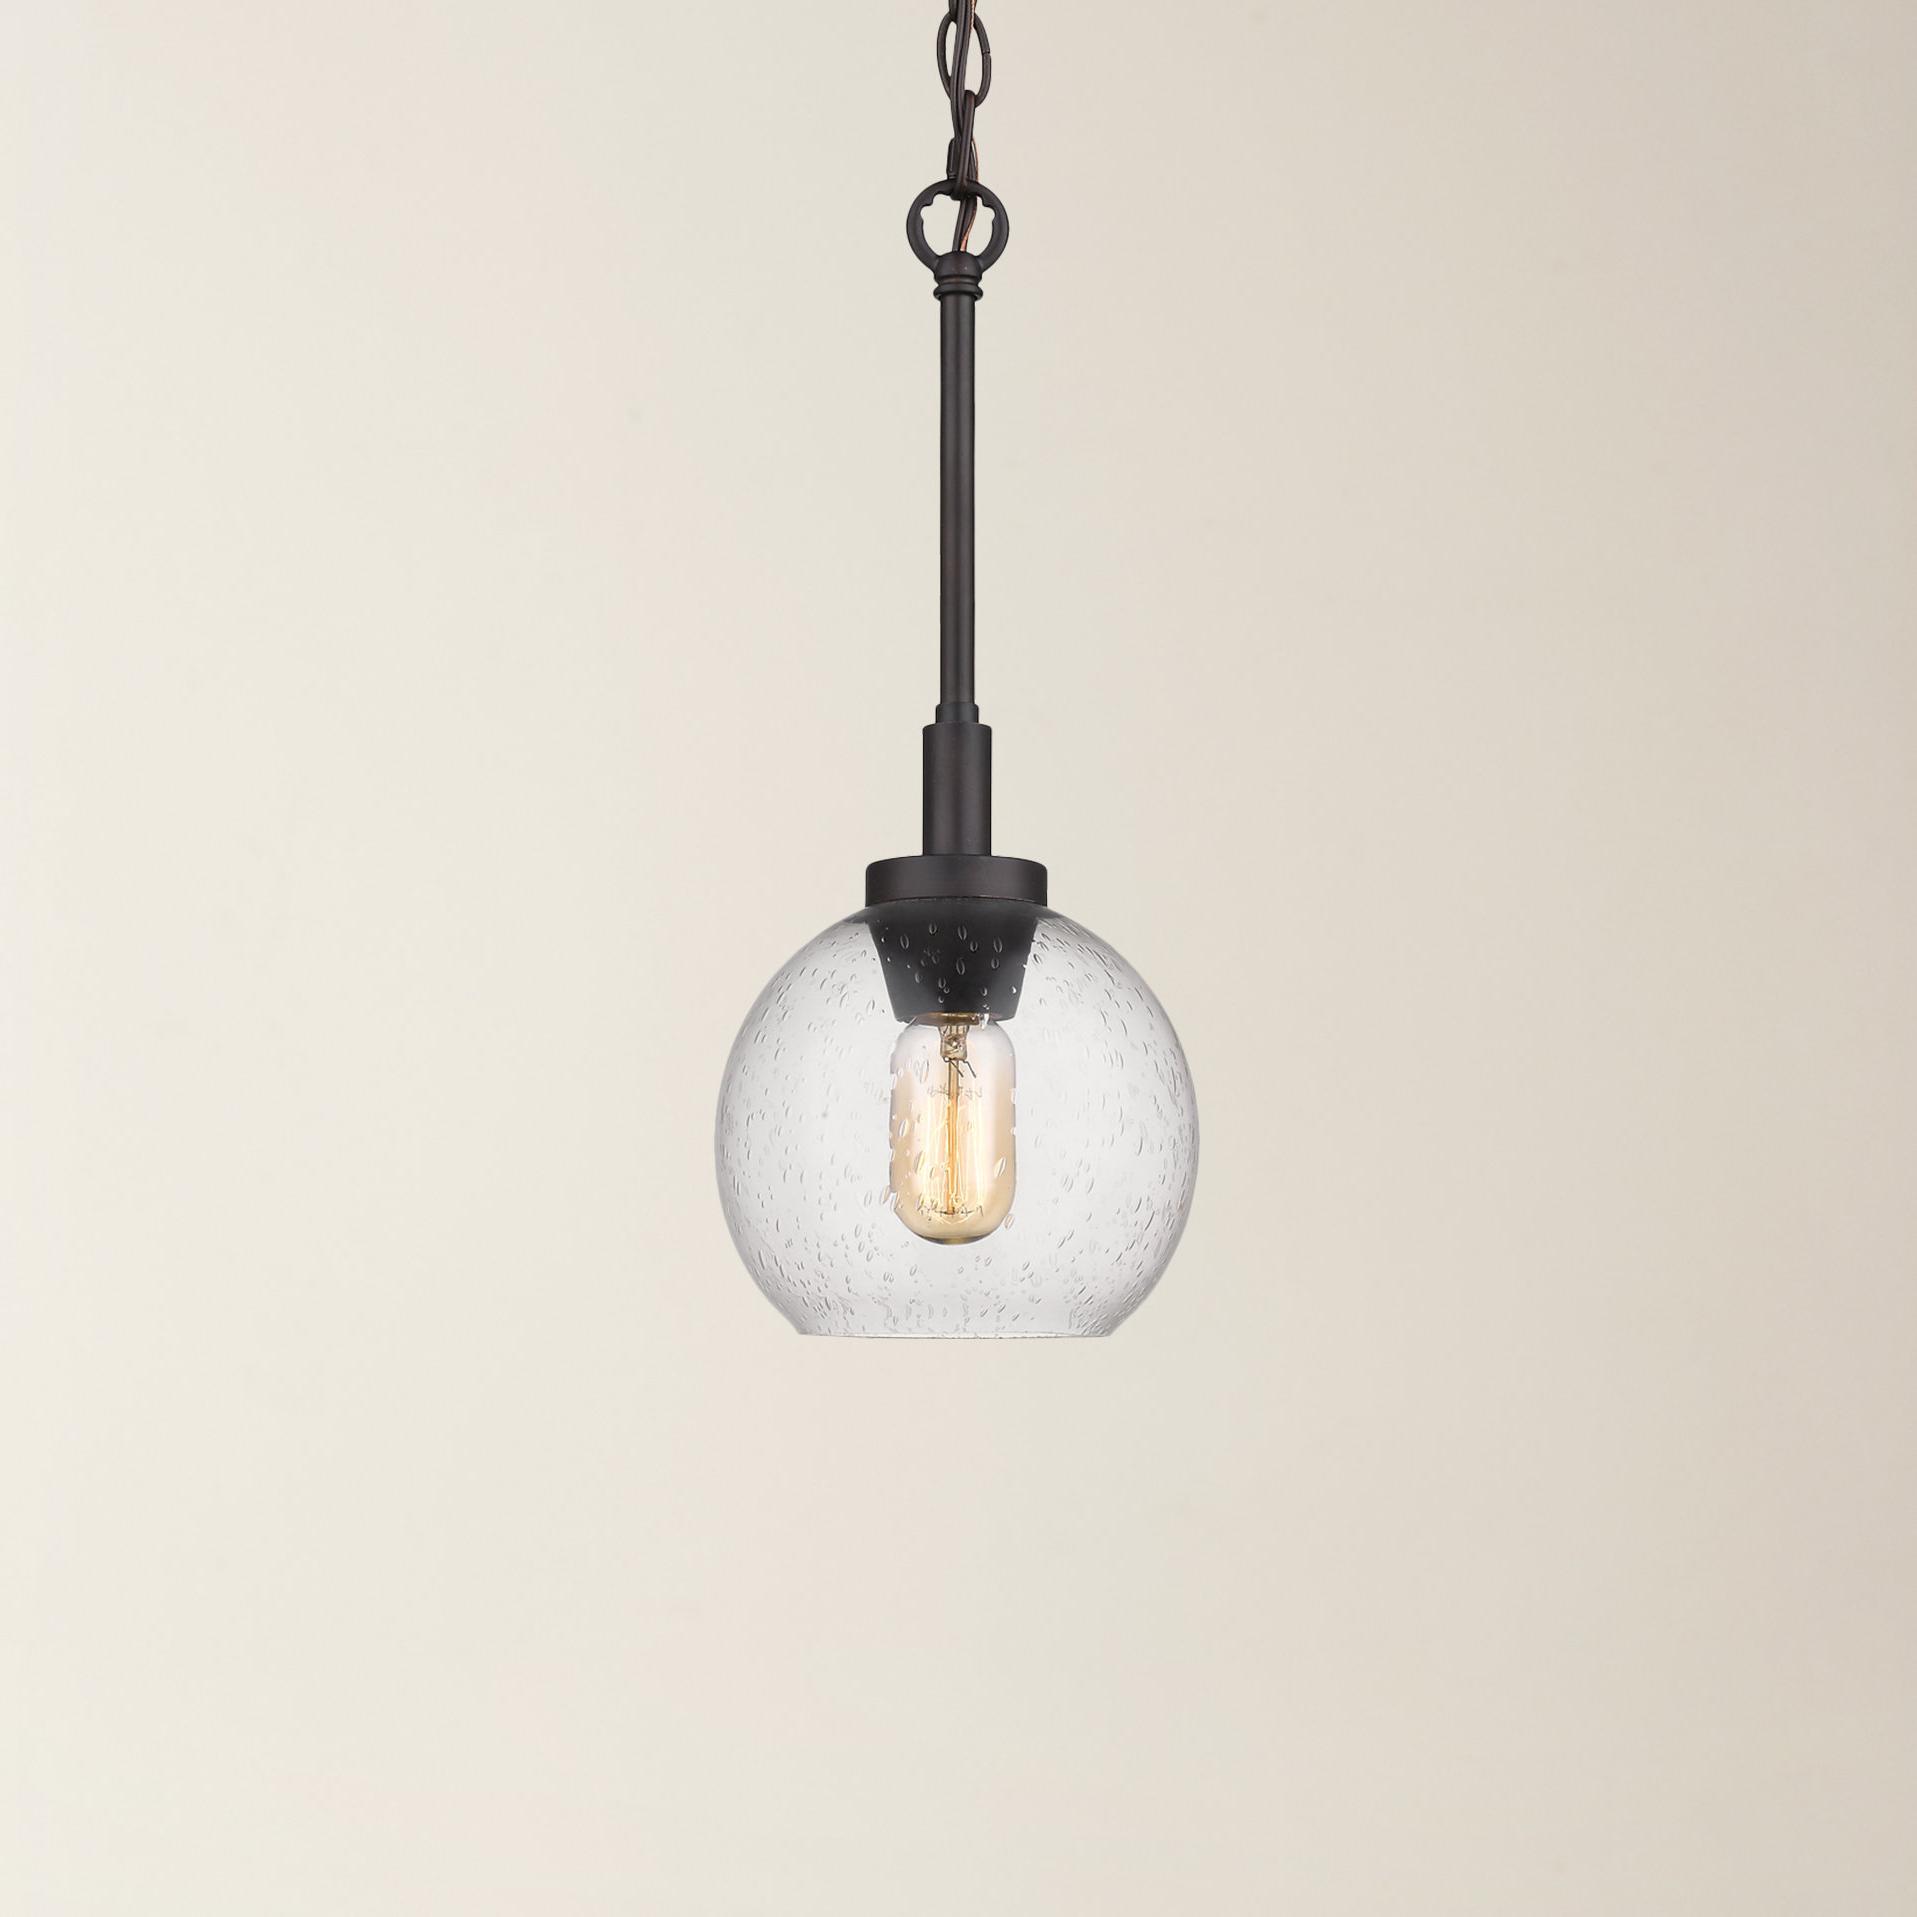 Fulton 1 Light Single Globe Pendant Regarding Most Recently Released Abordale 1 Light Single Dome Pendants (View 11 of 20)